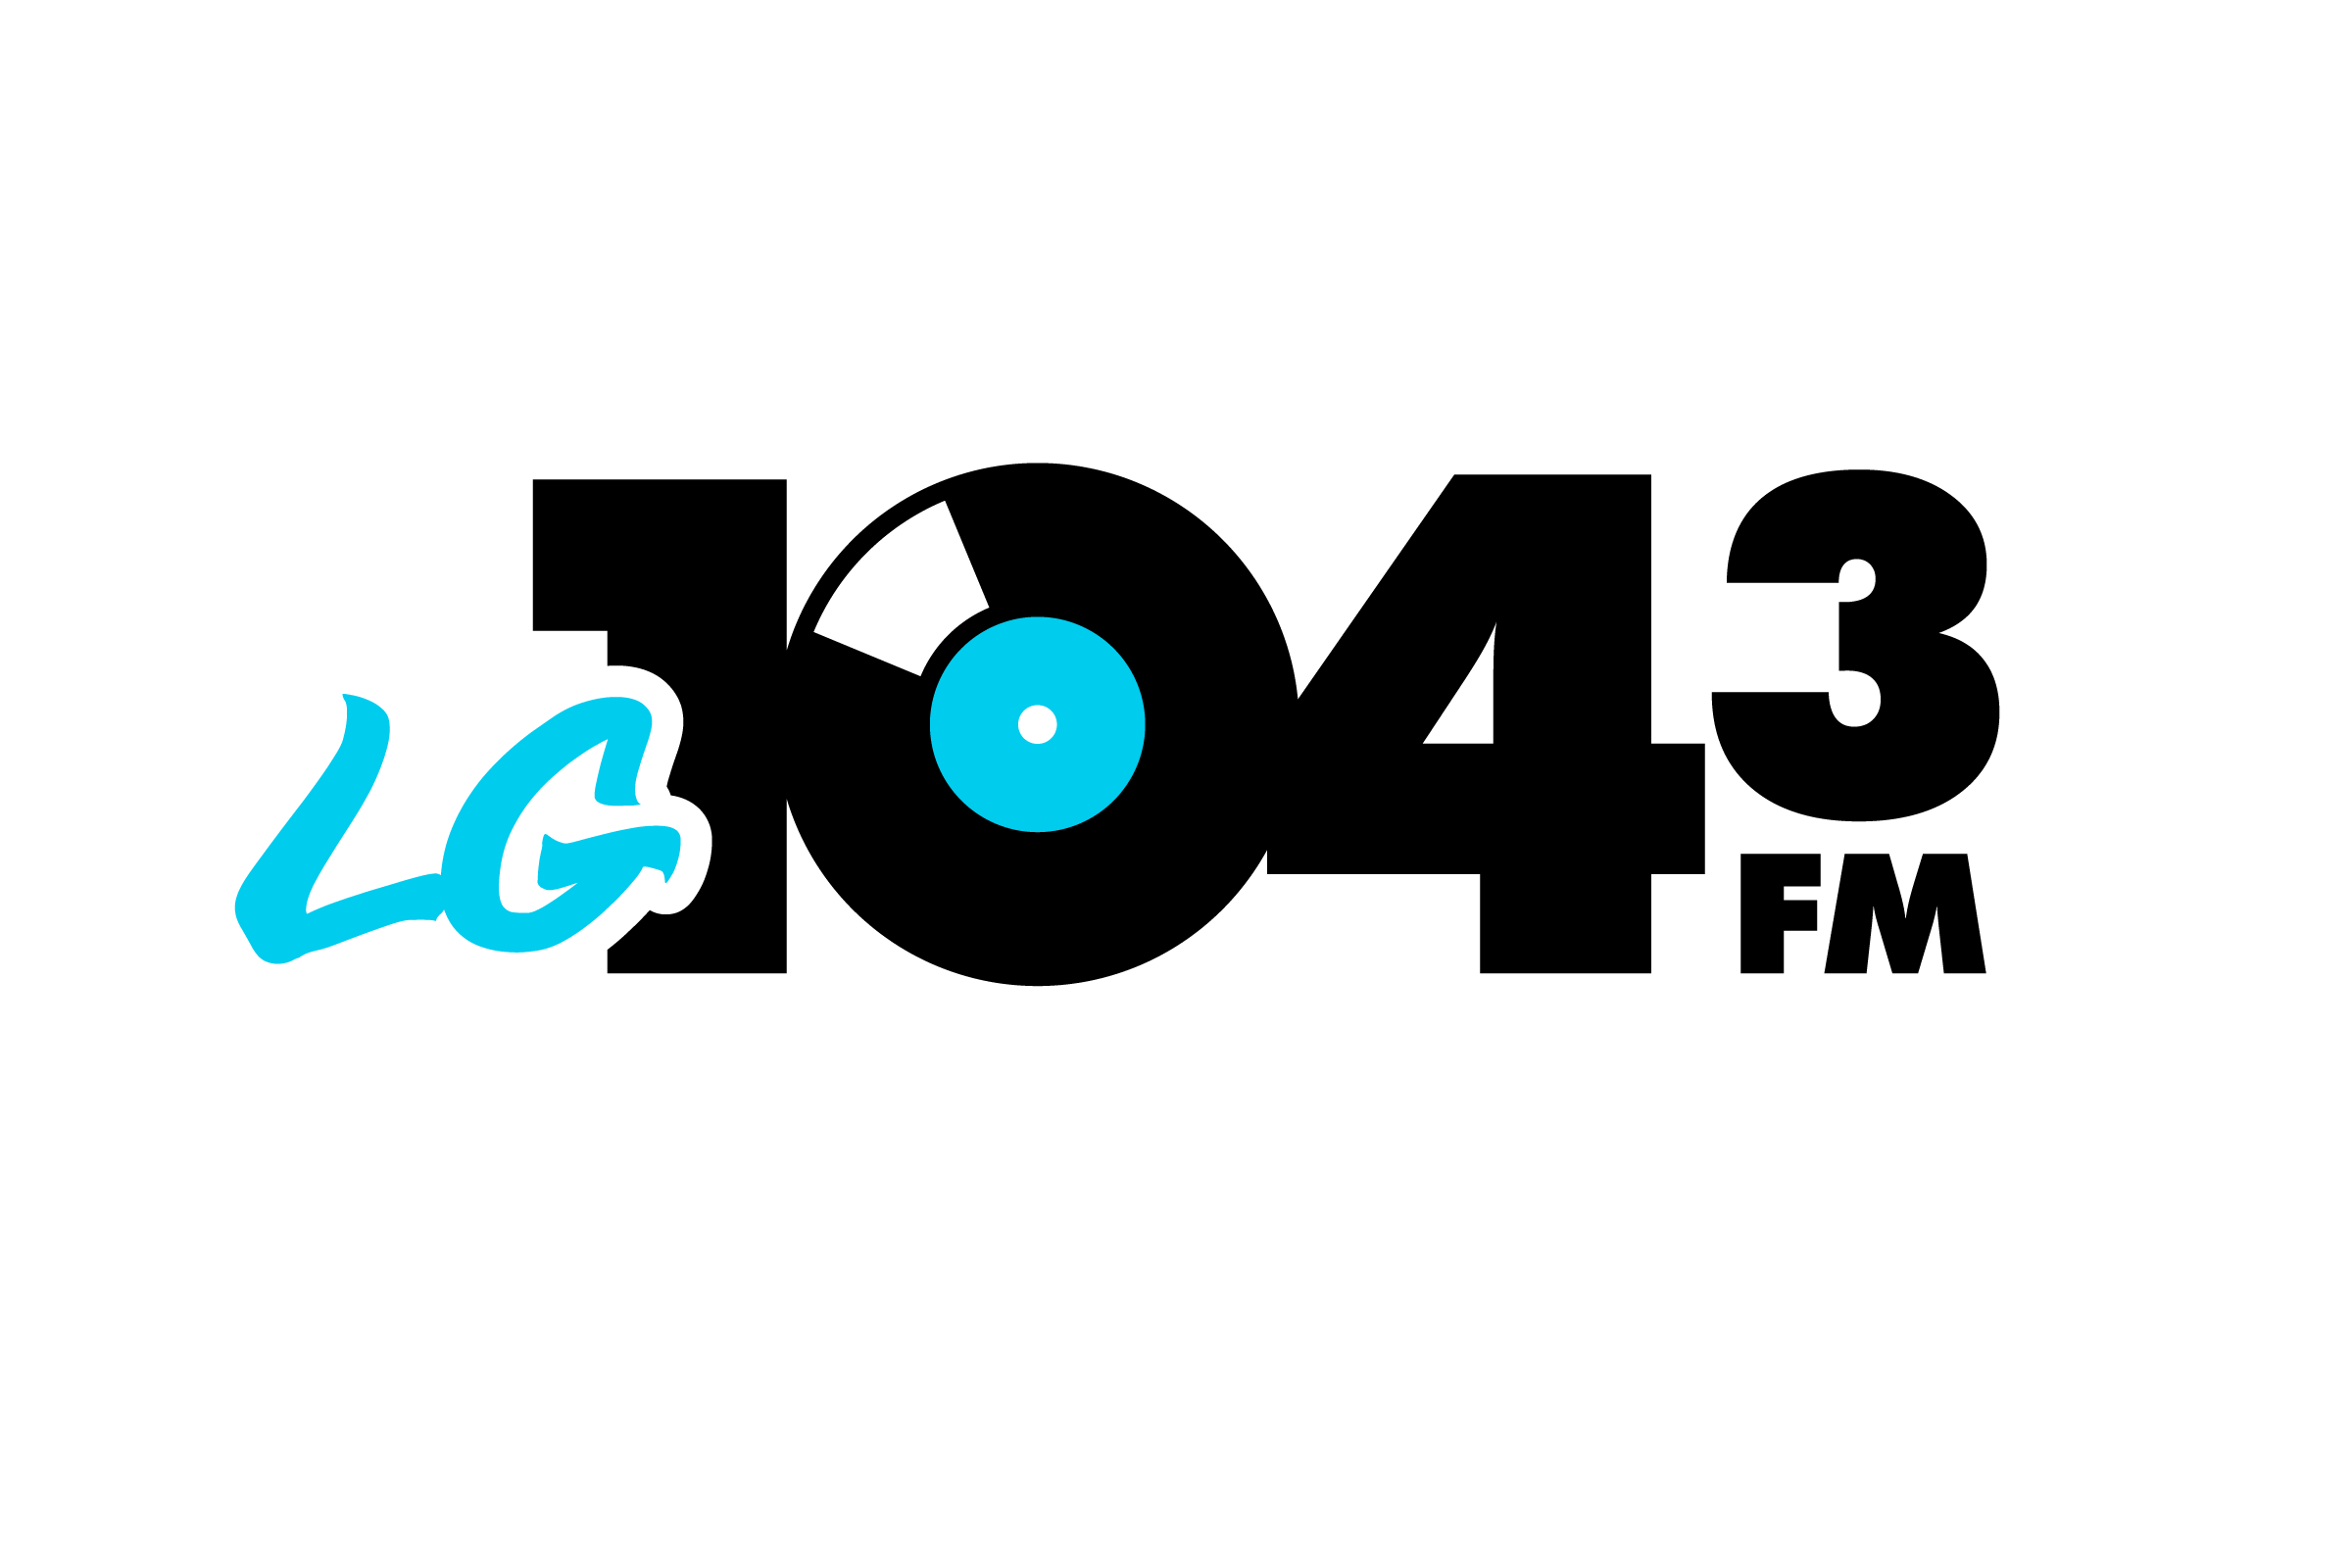 LG104 3